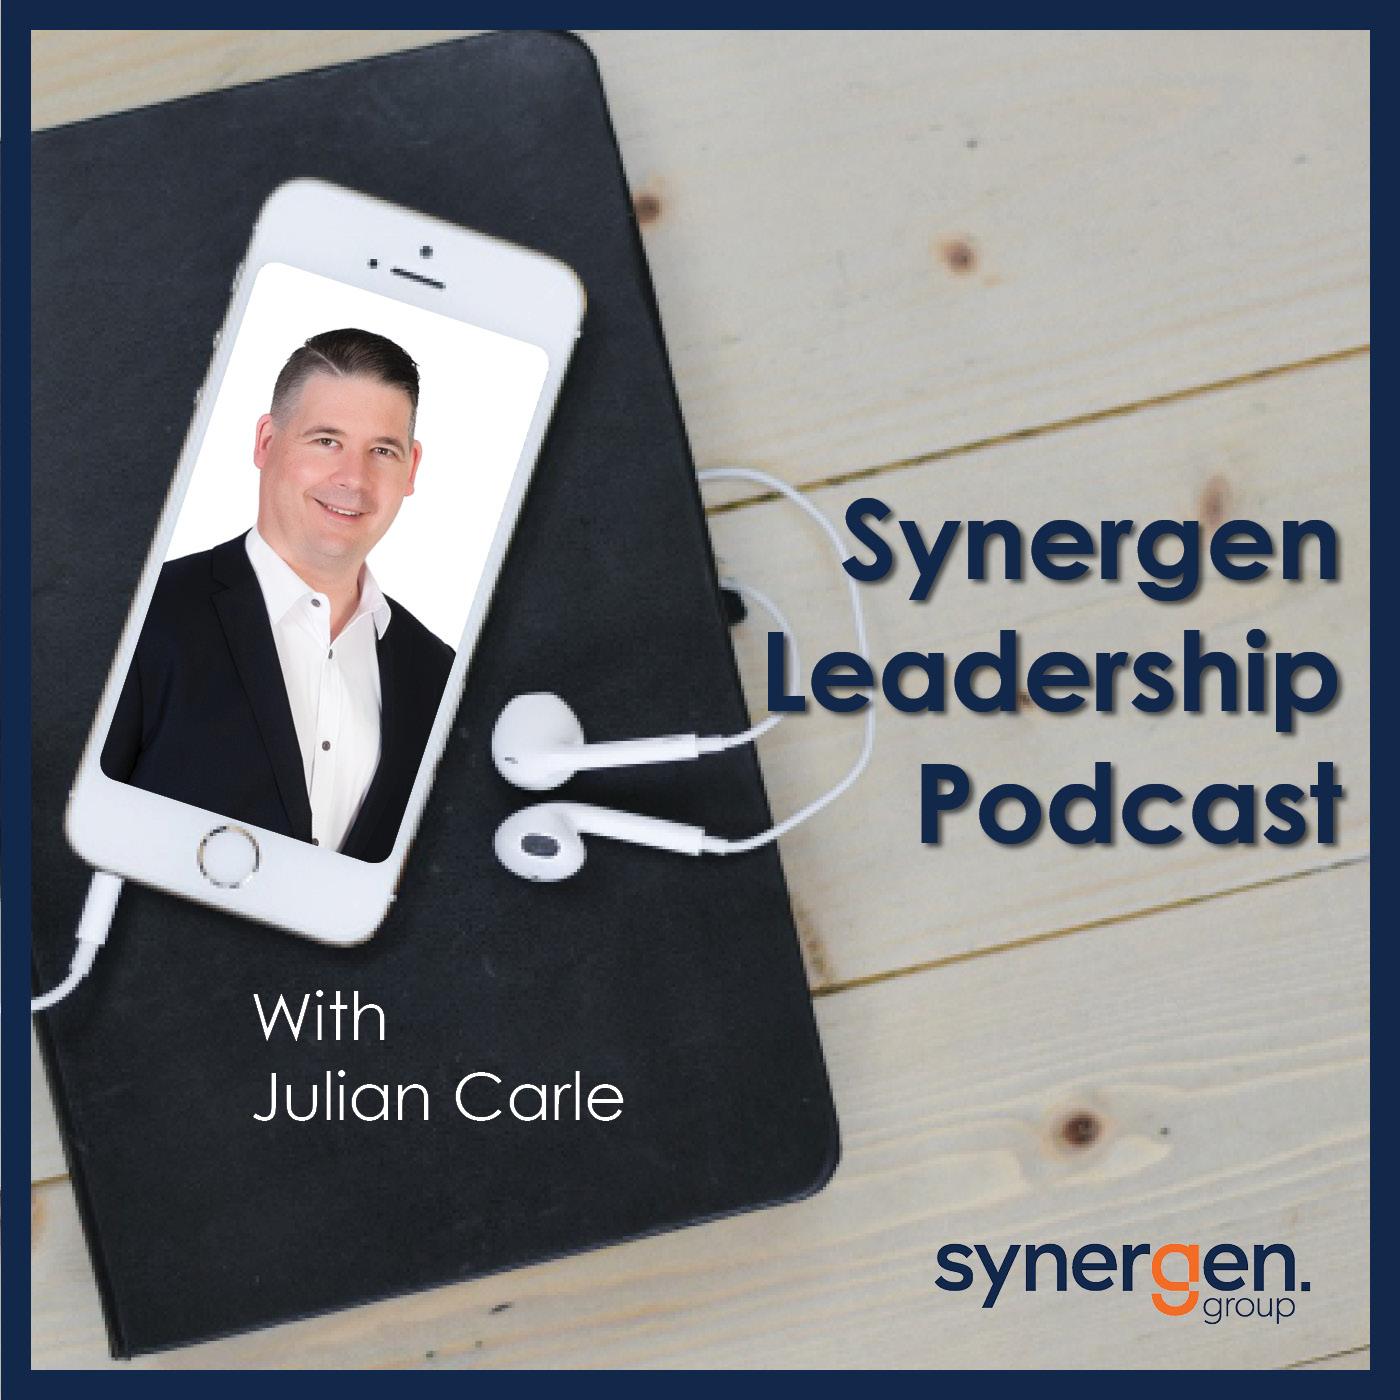 Synergen Leadership Podcast show art